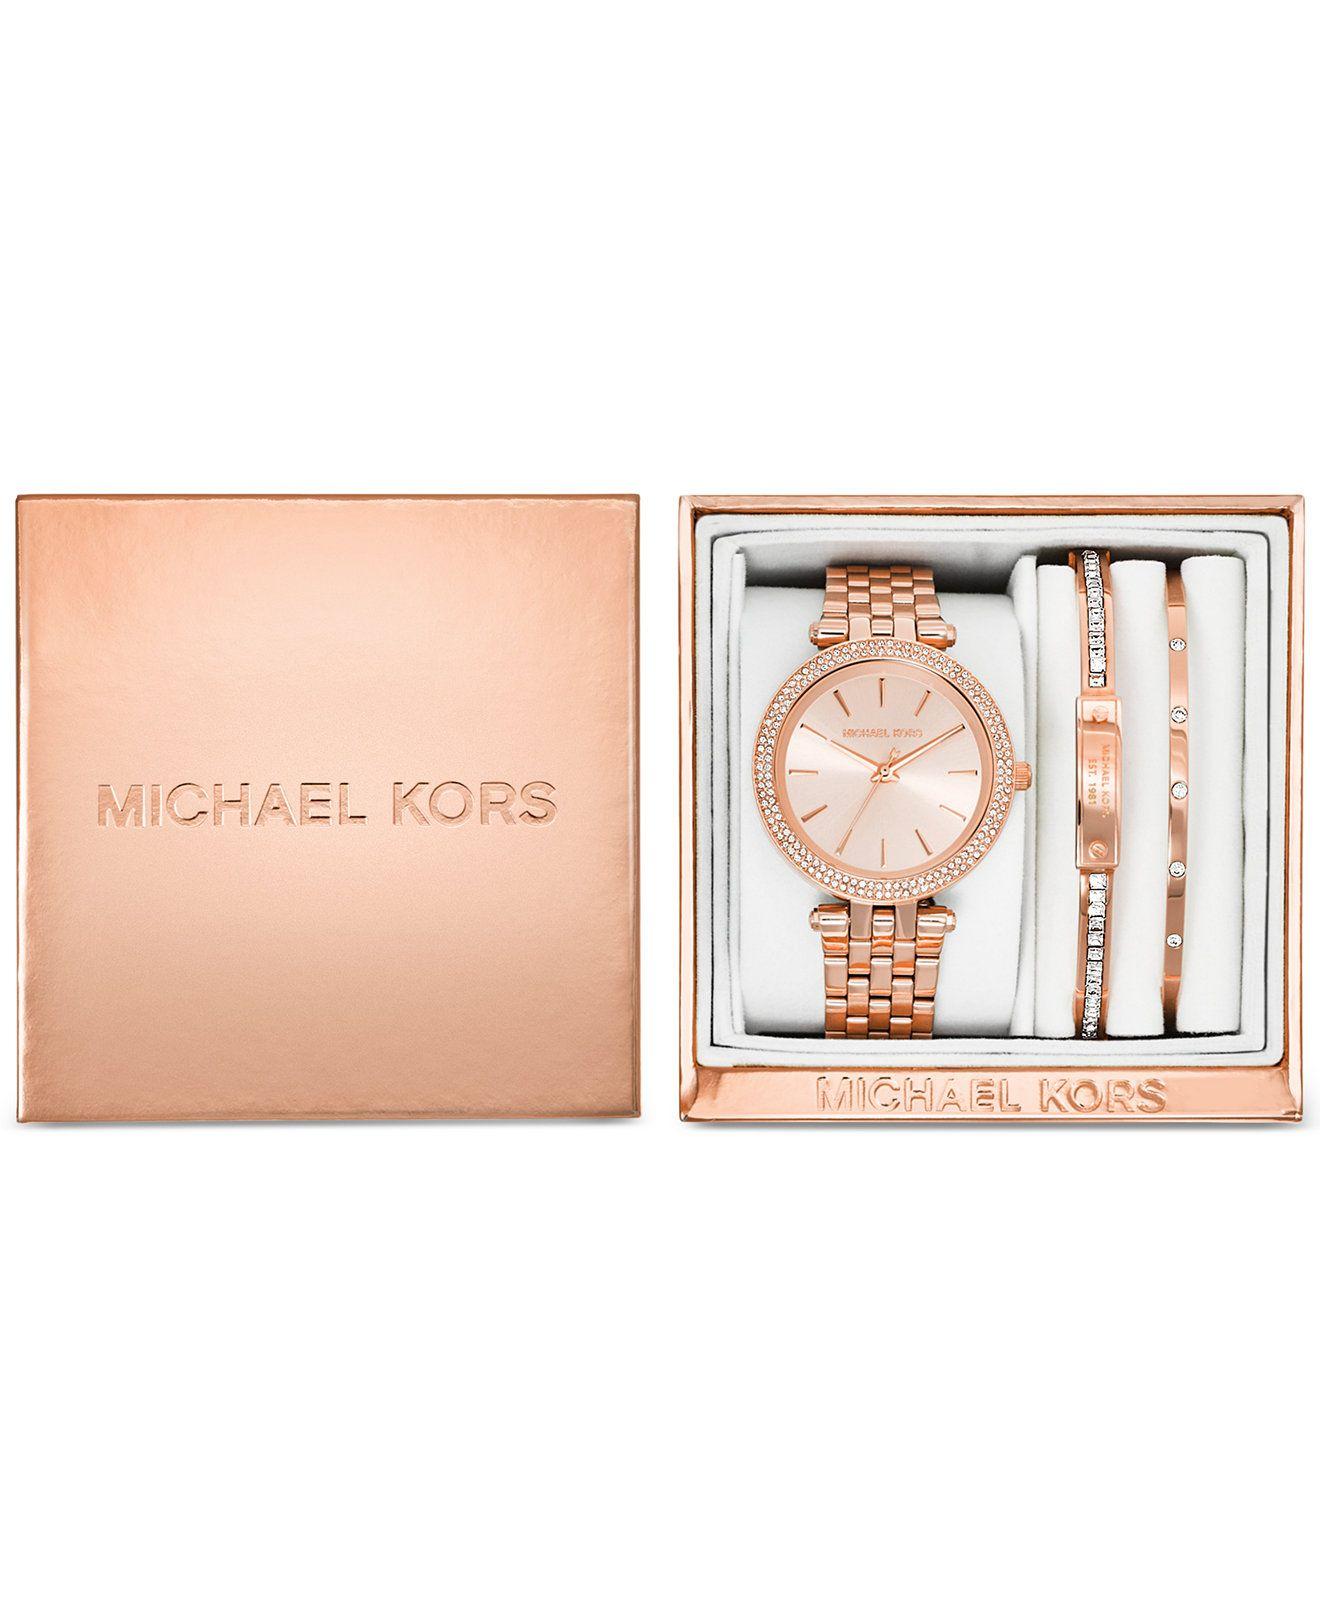 8b349d66685f Michael Kors Women s Mini Darci Rose Gold-Tone Stainless Steel Bracelet  Watch Gift Set 33mm